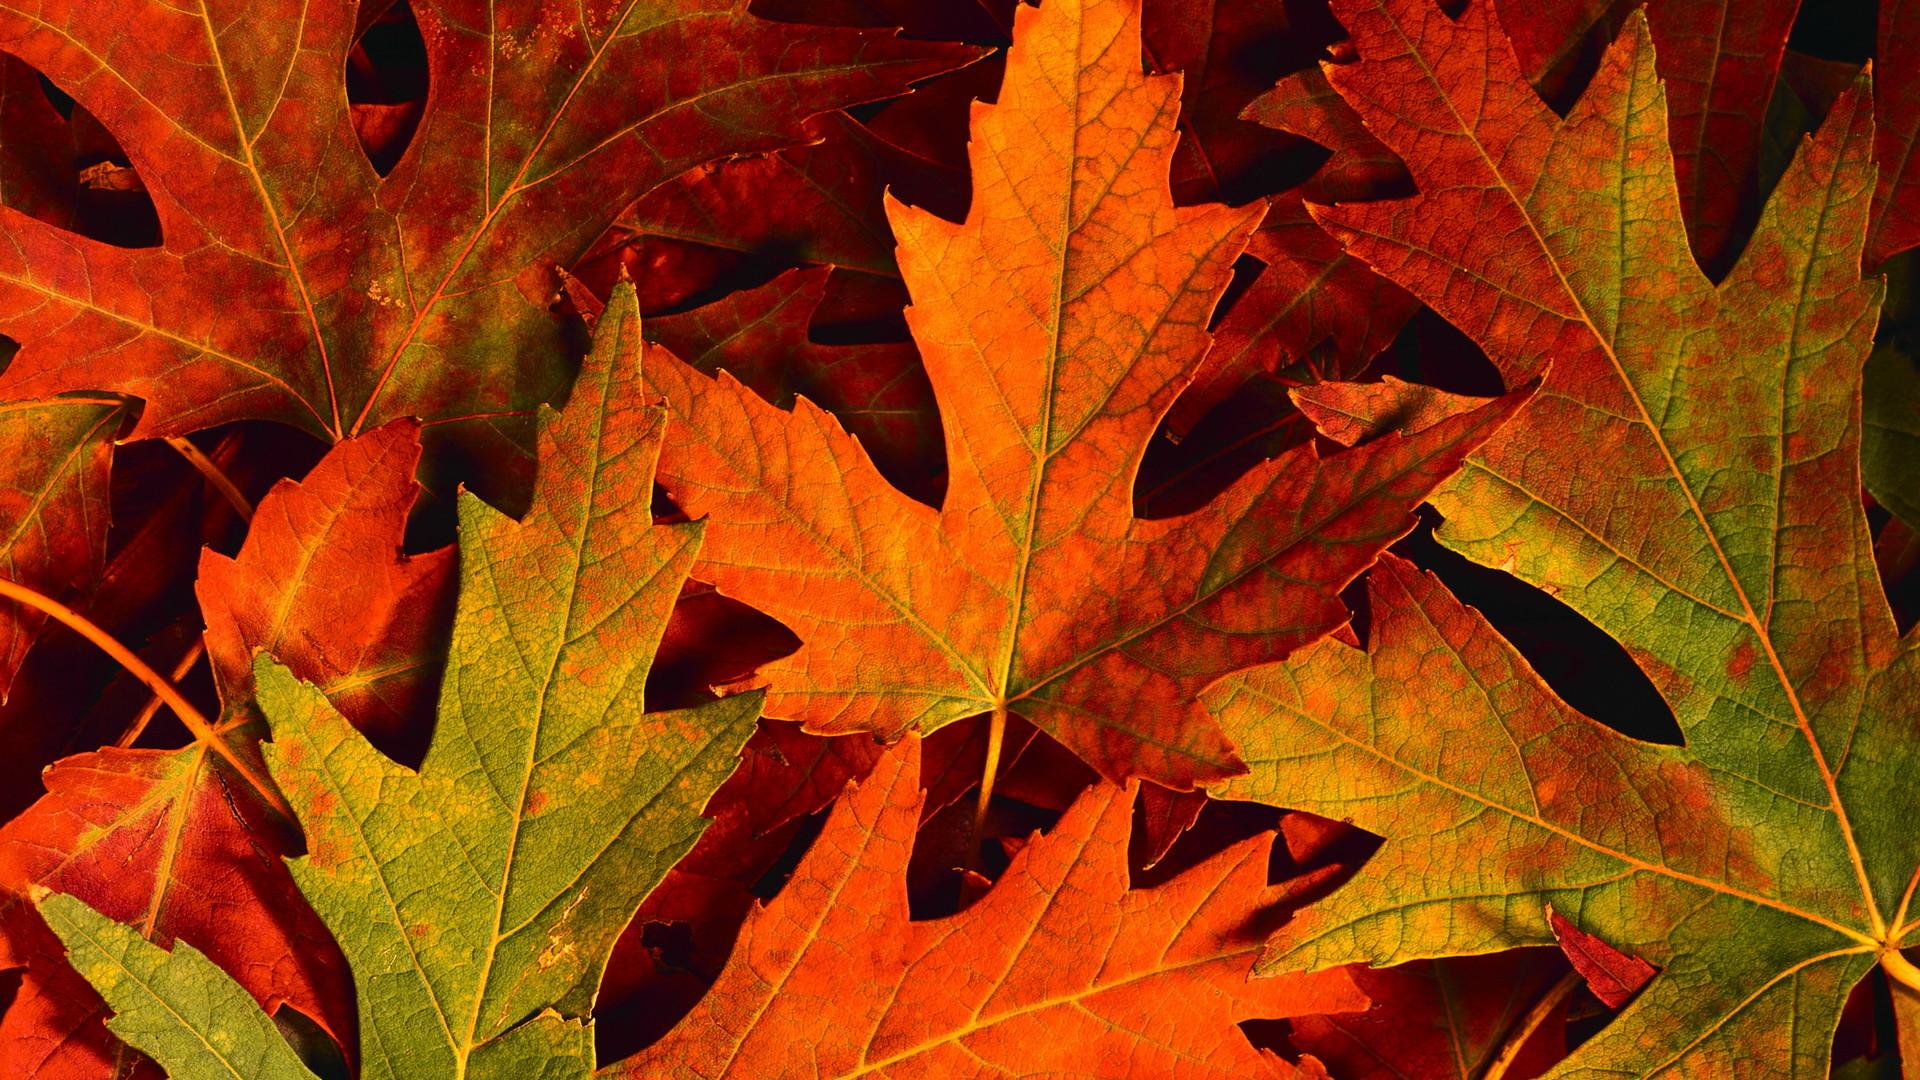 Colourful Autumn Leaves Hd Desktop Wallpaper